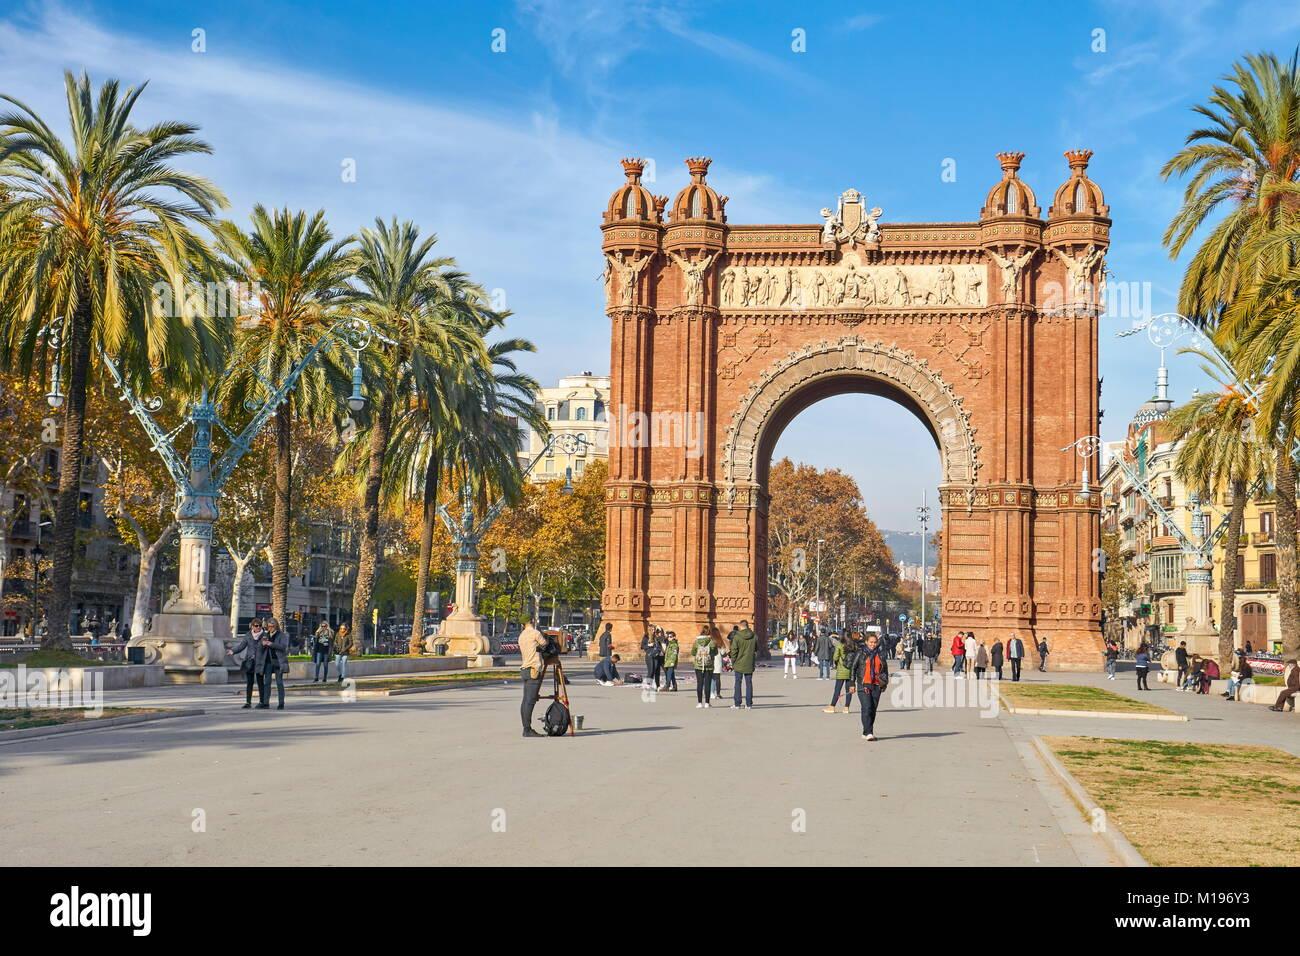 Arc de Triomf o Arco del Triunfo, Barcelona, Cataluña, España Imagen De Stock